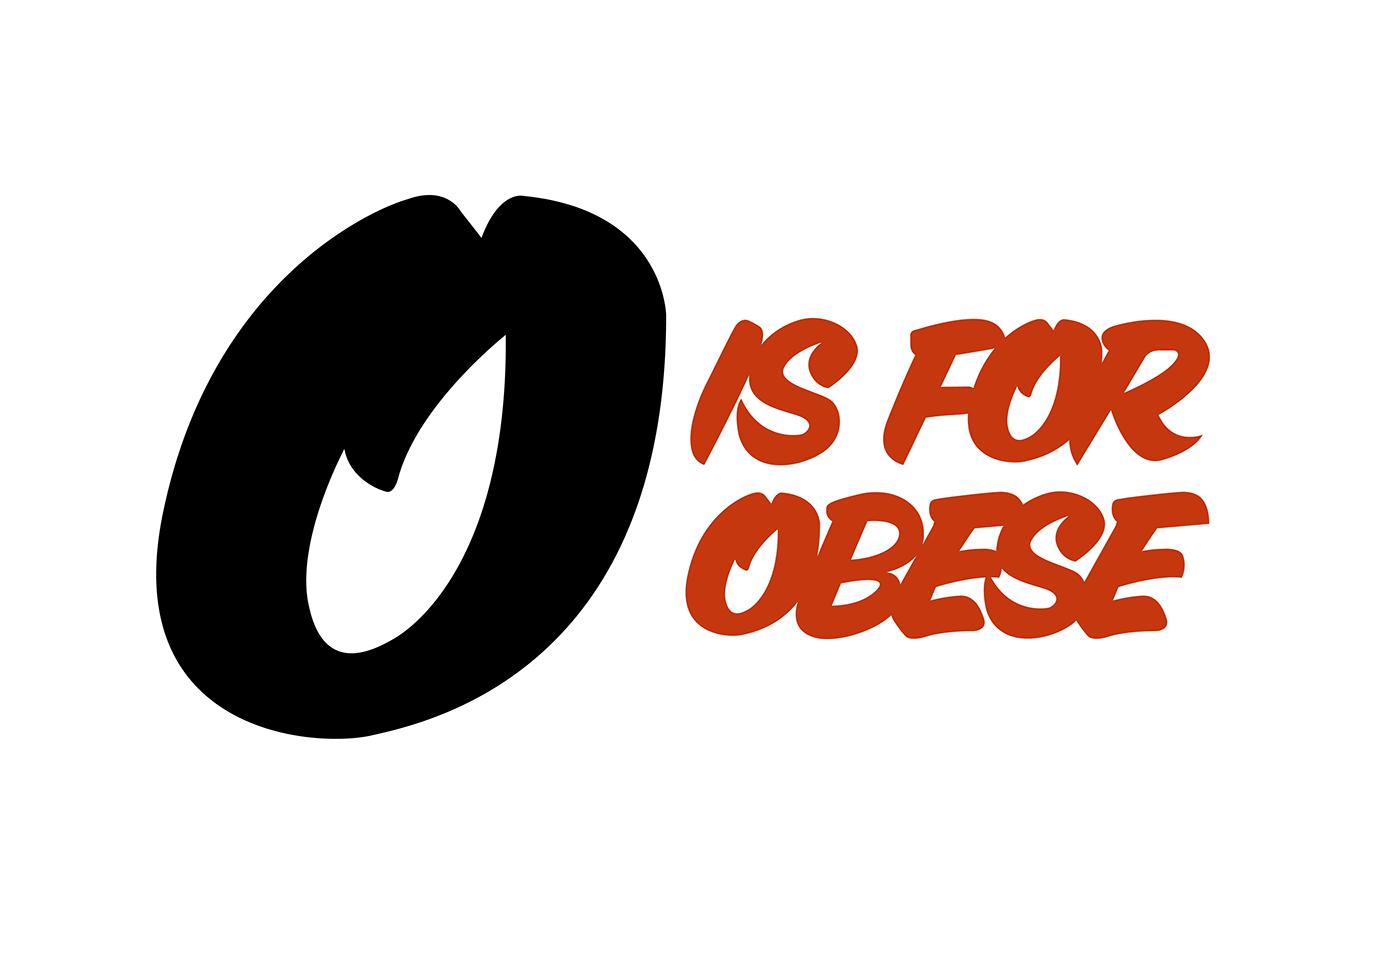 oaf-font-3